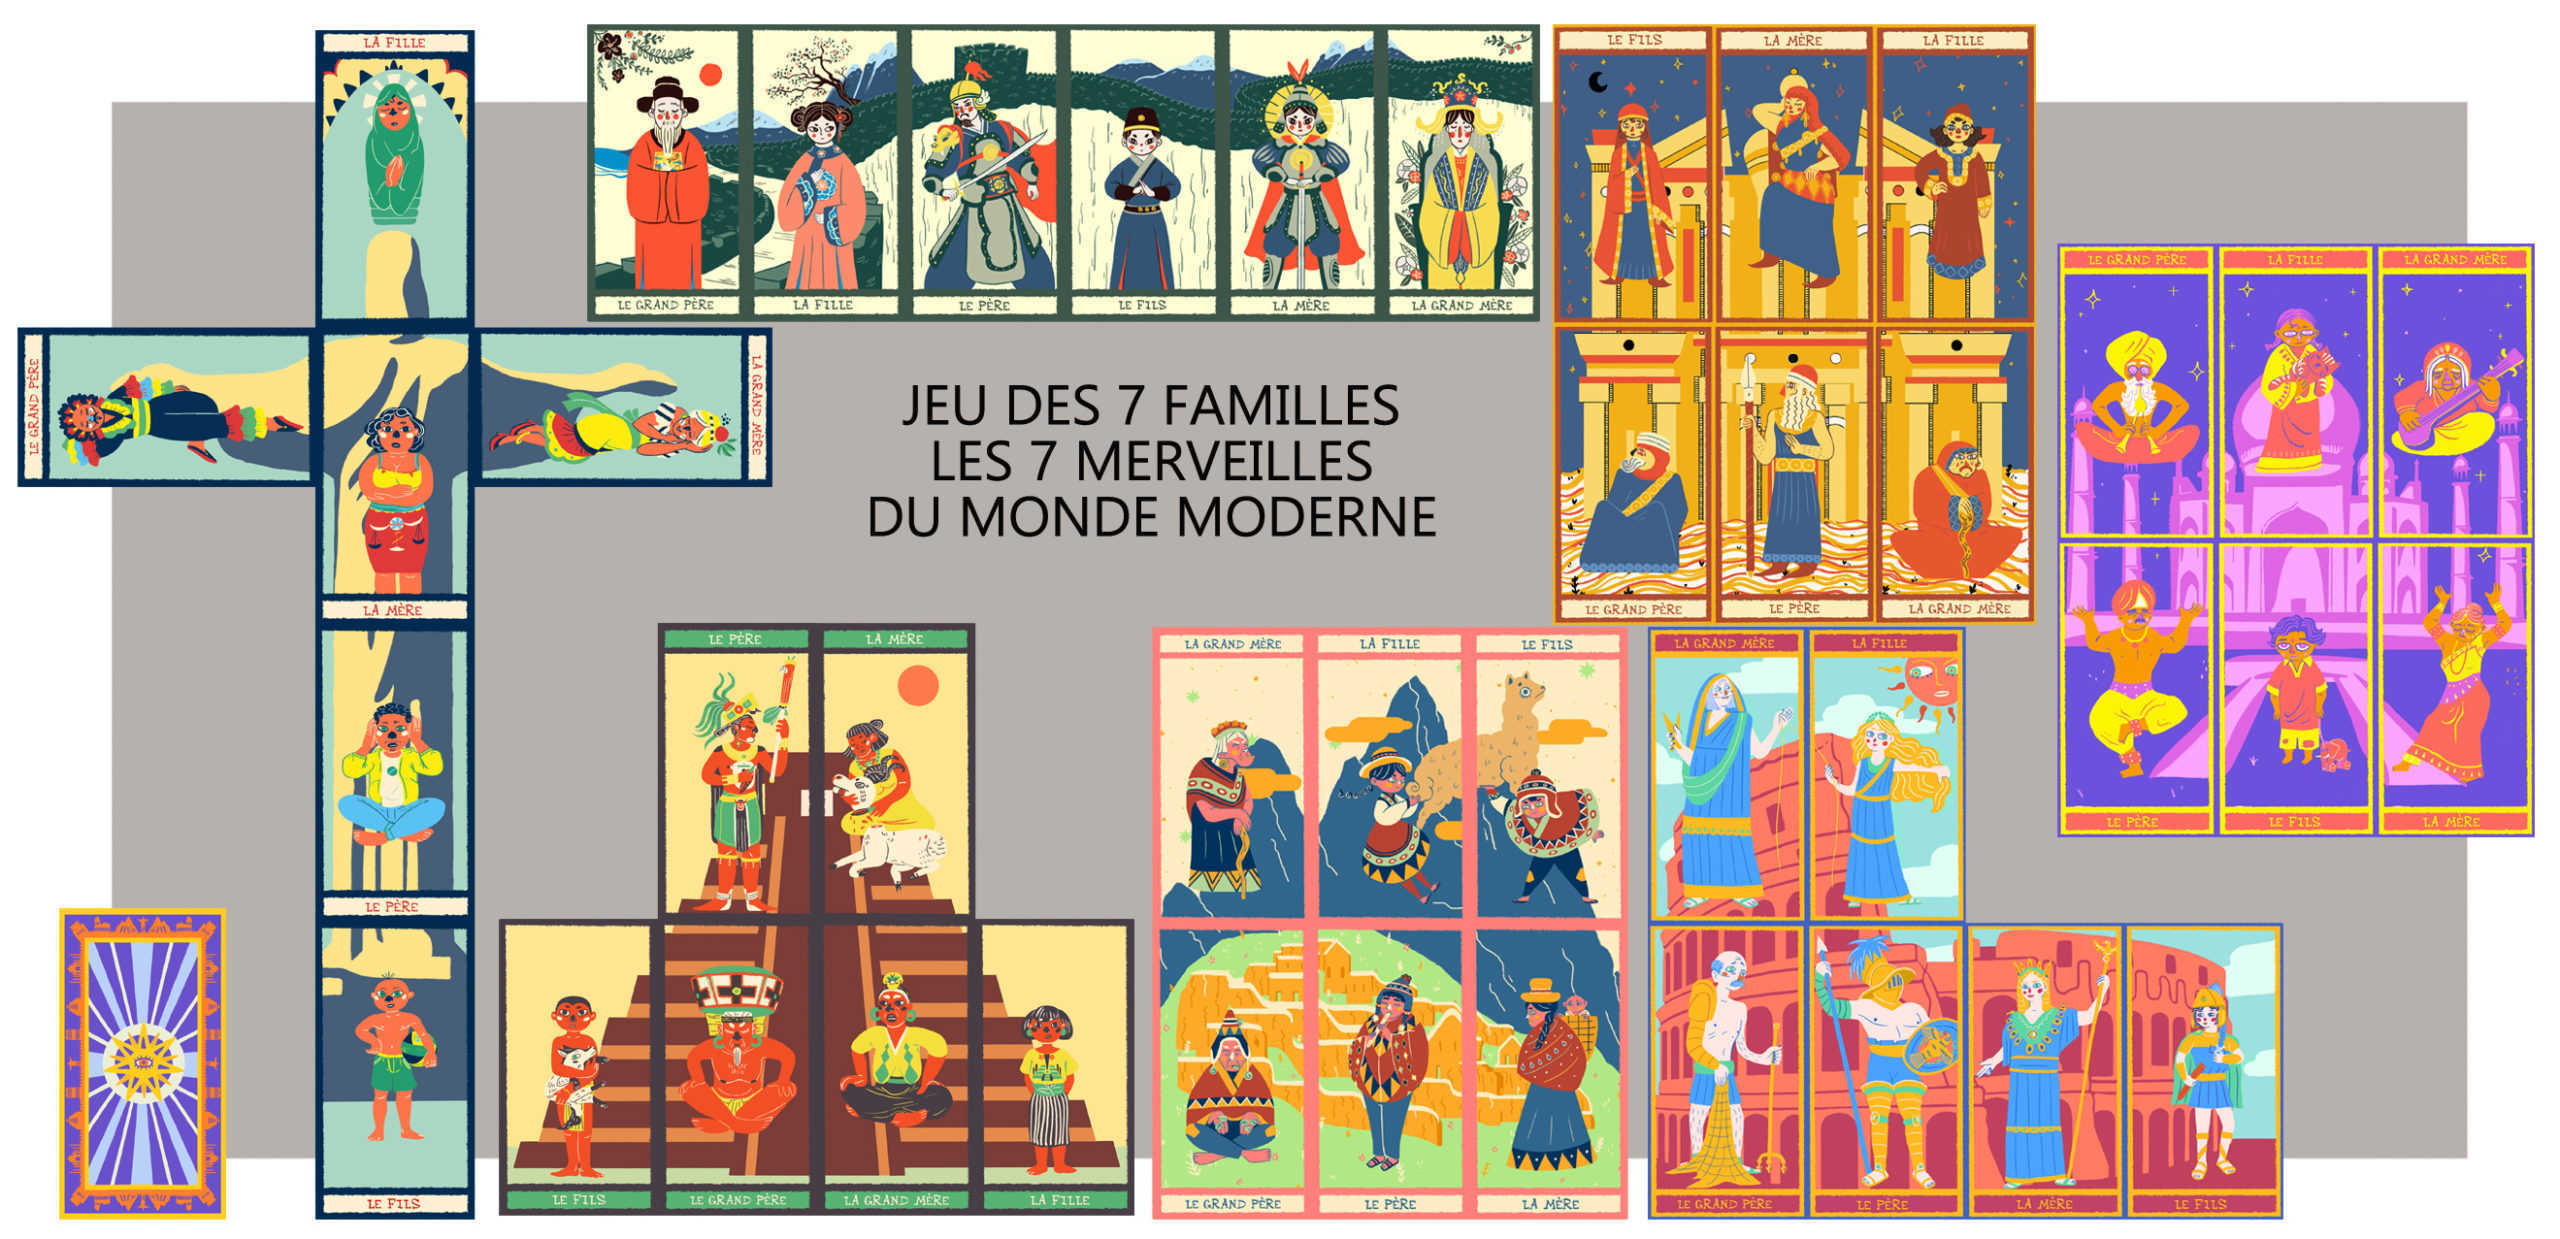 7-familles-merveilles-1a-scaled.jpg